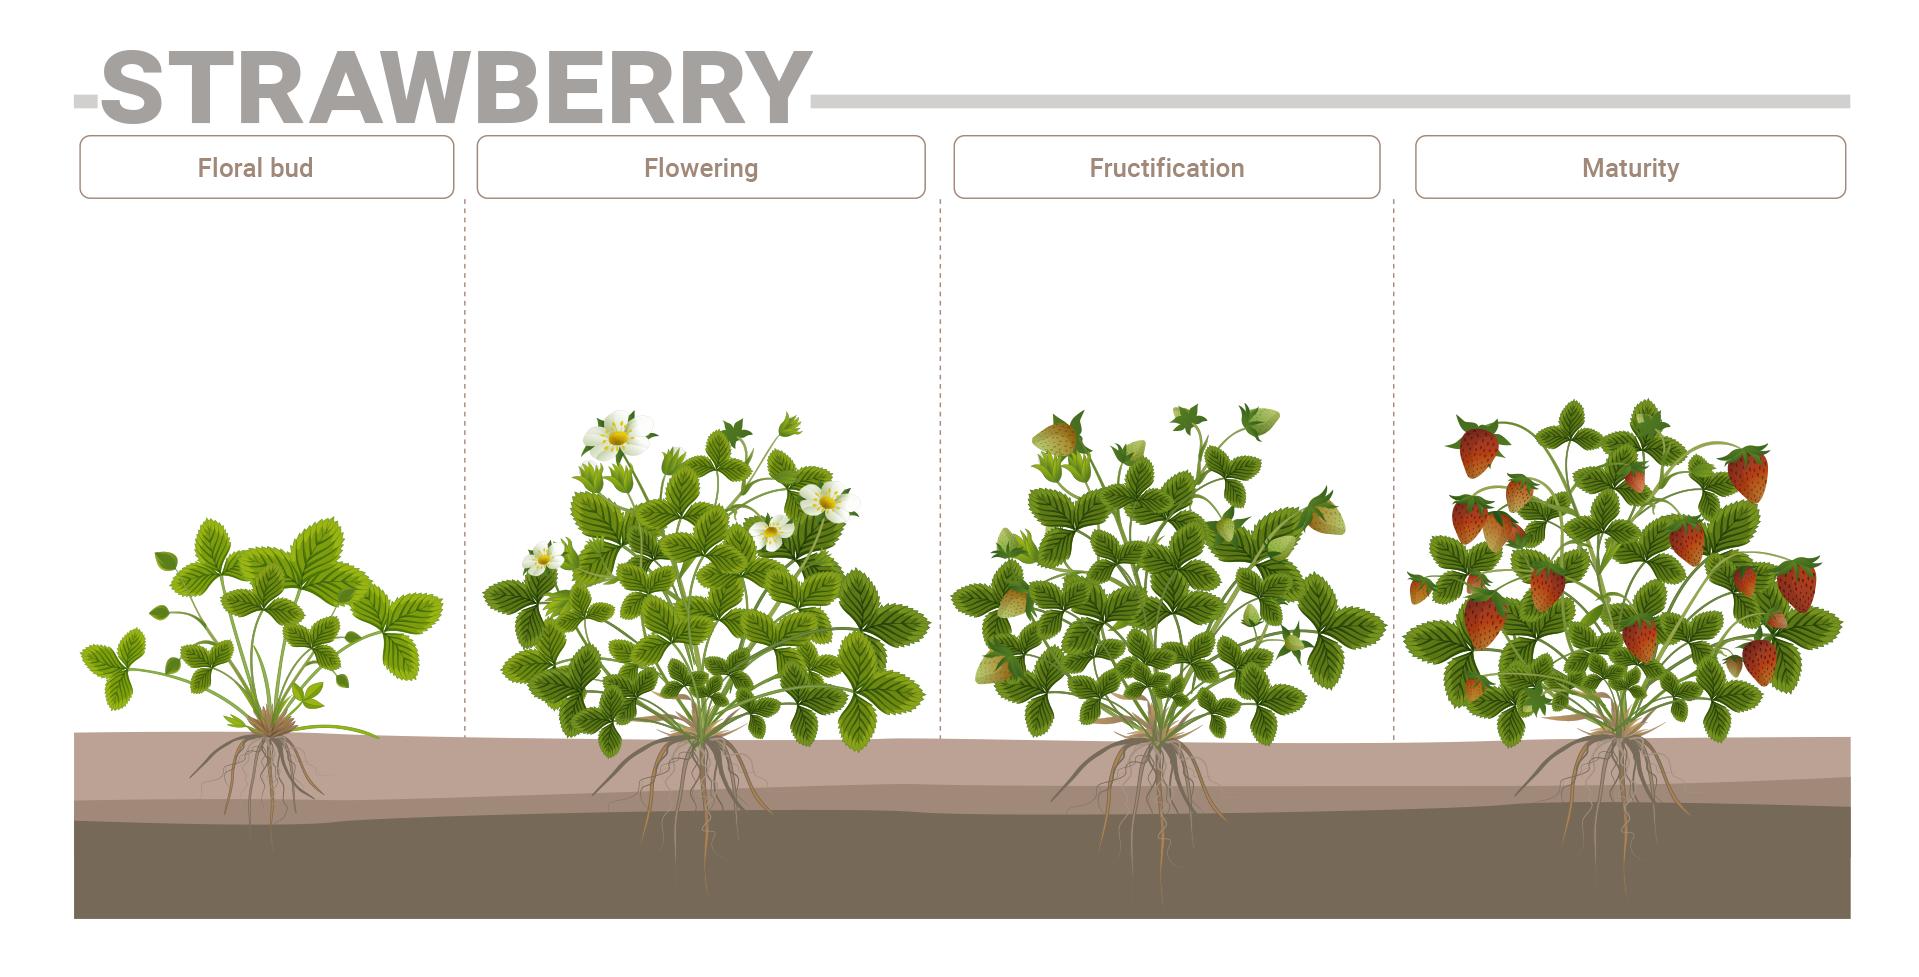 Strawberry phenological